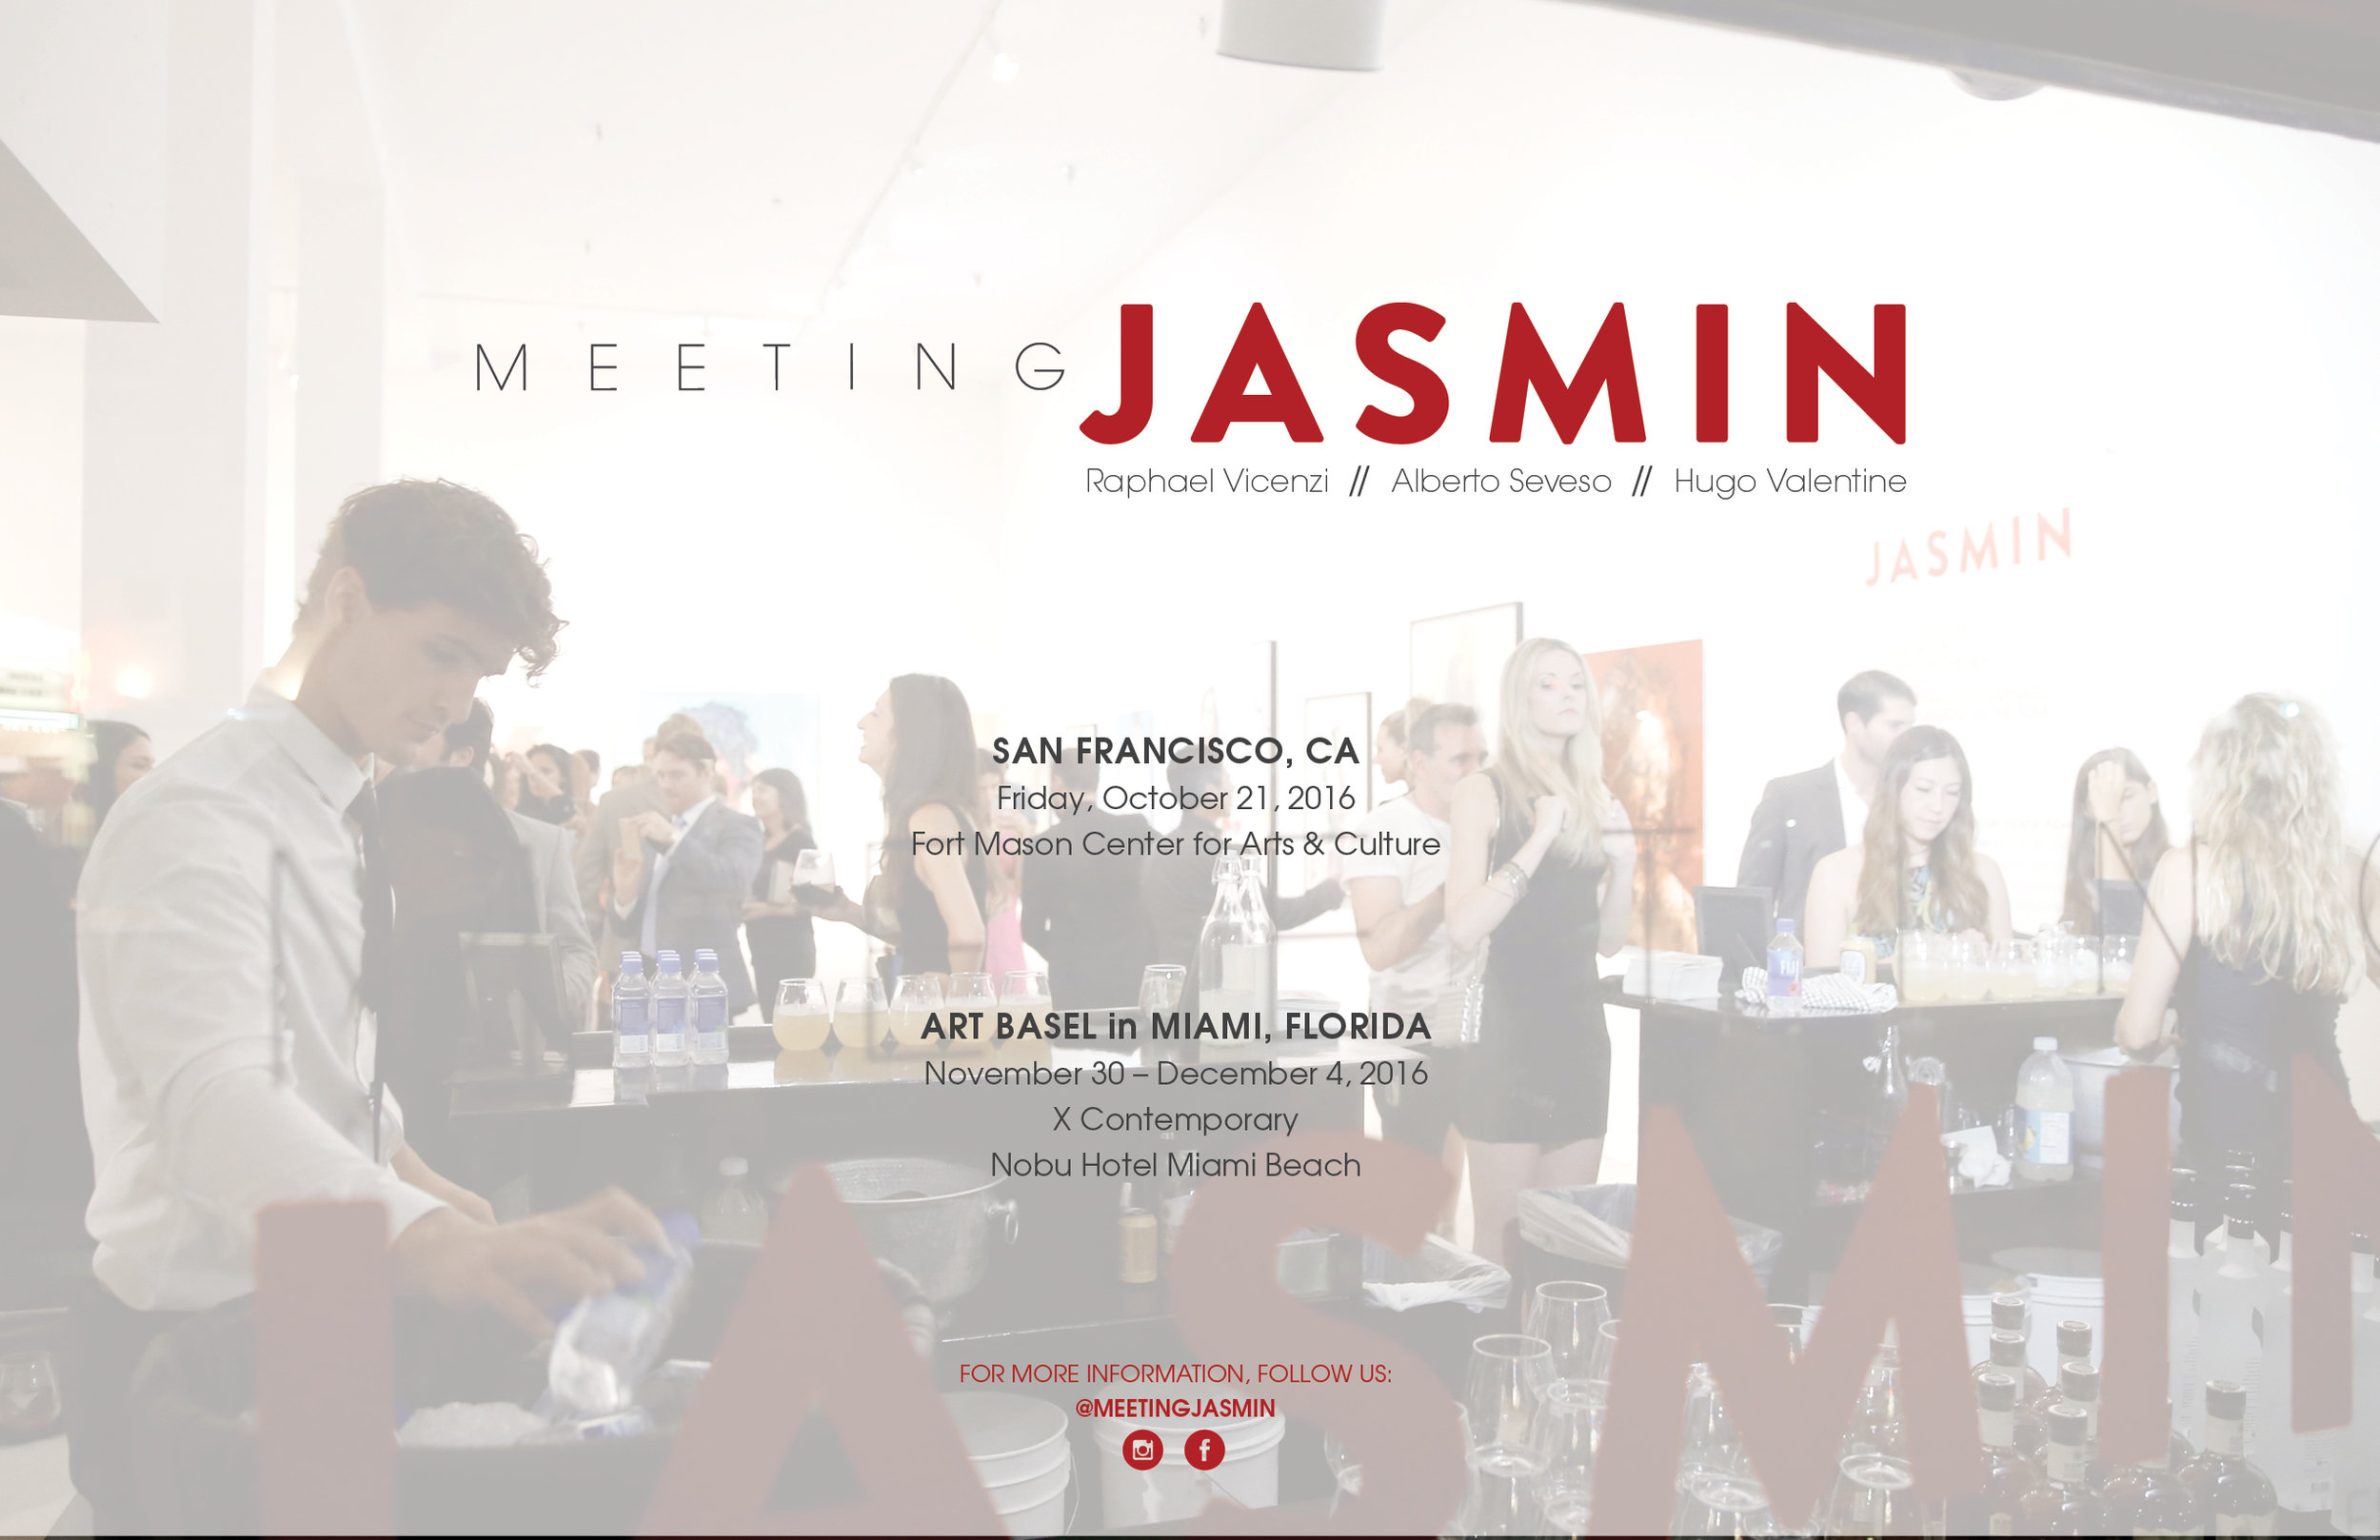 1316-Meeting Jasmin Retrospective Deck_Mockup15.jpg